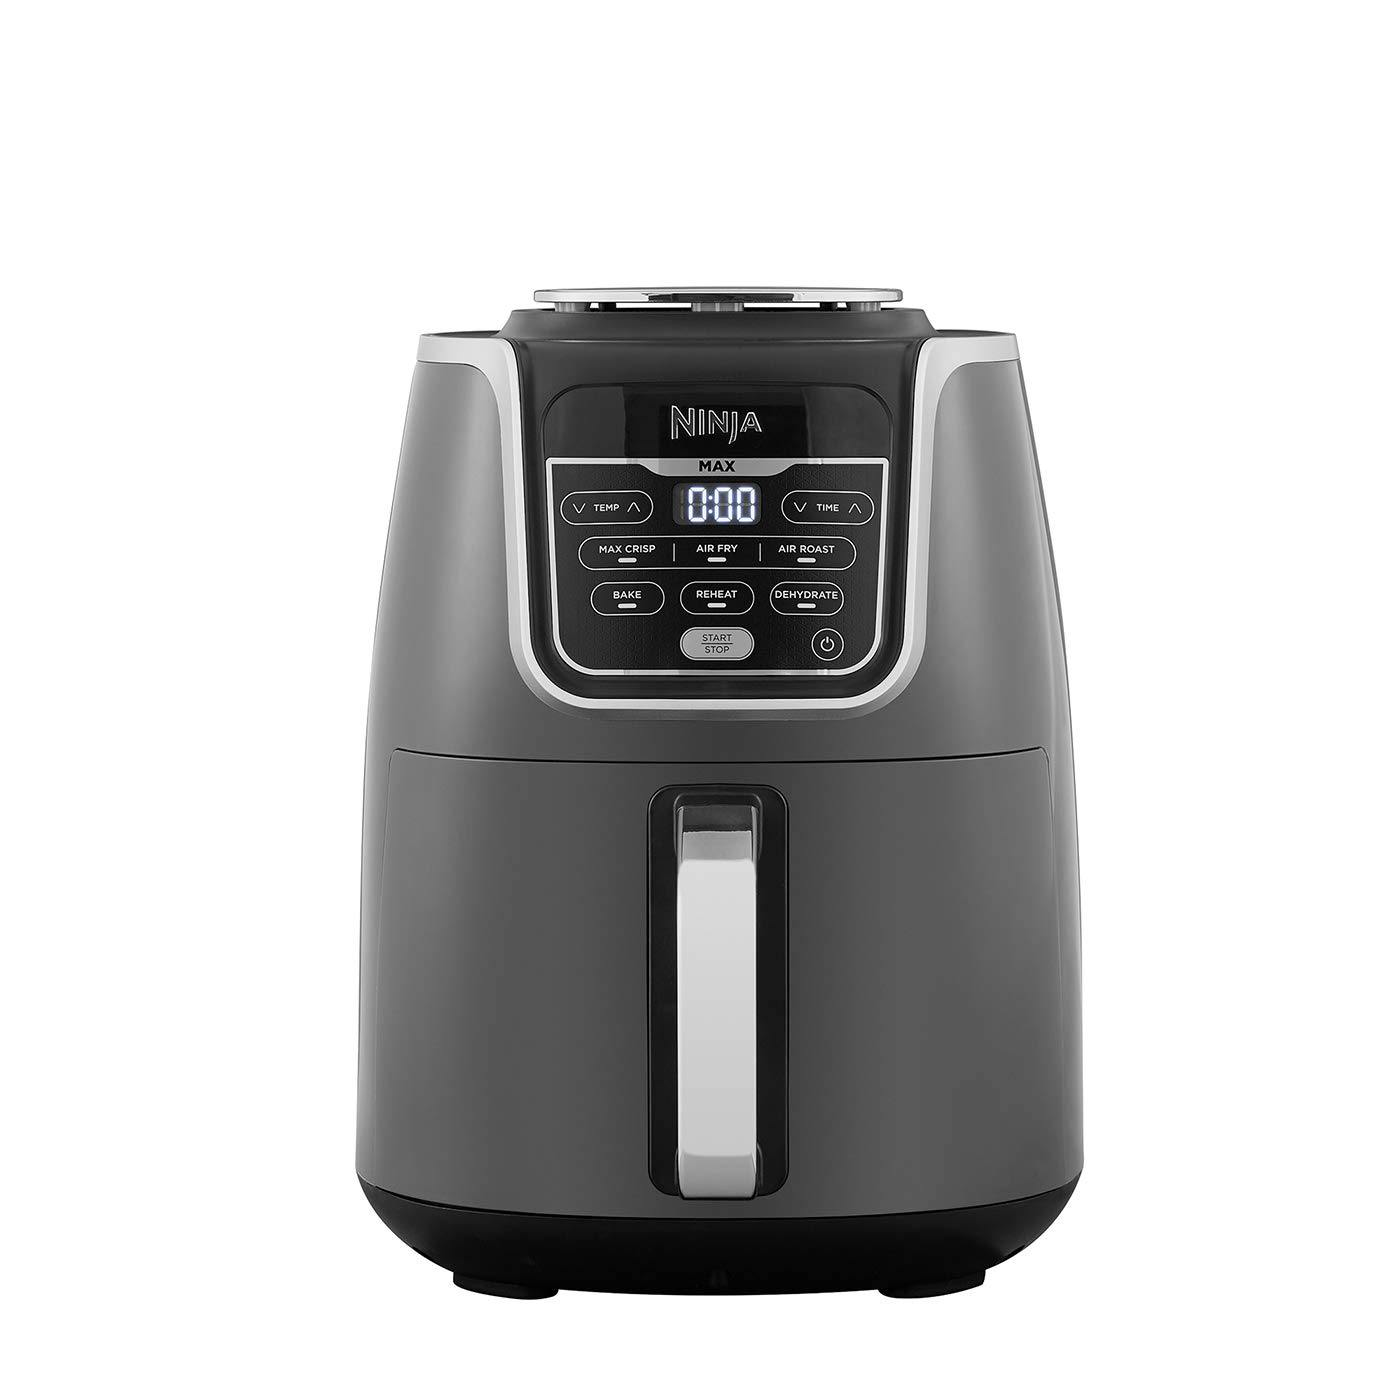 Ninja Air Fryer MAX, 5.2L, 6 Cooking Functions, 1750W, Grey ...